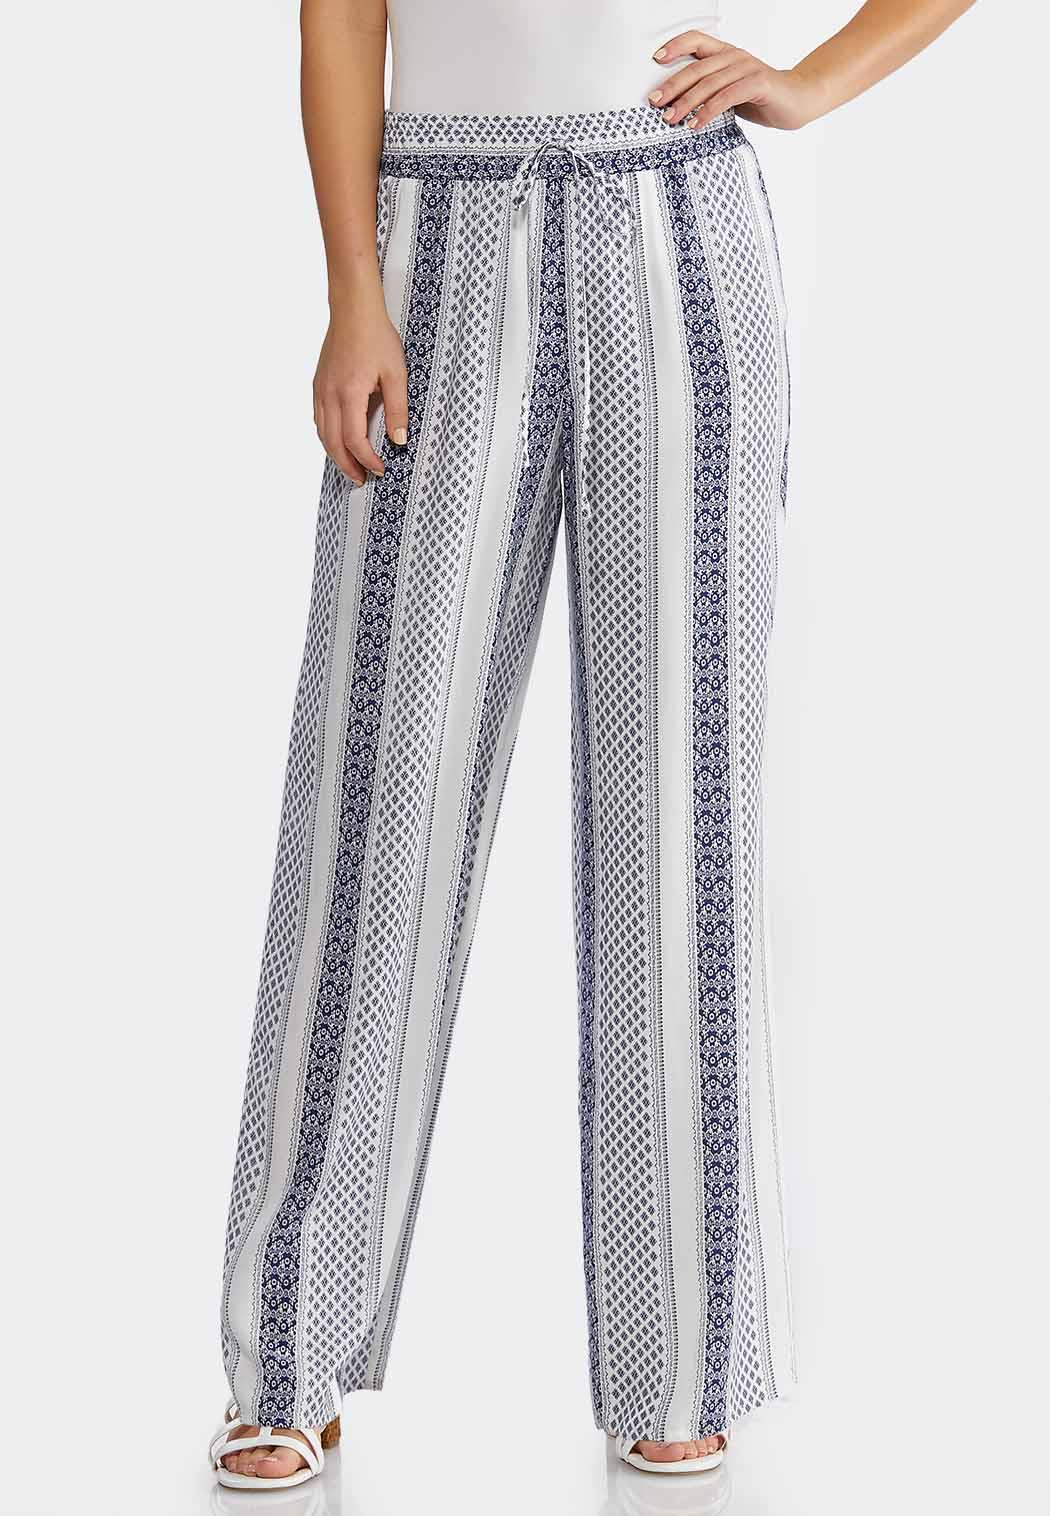 e9db16e5bee Women s Pants - Palazzo Pants